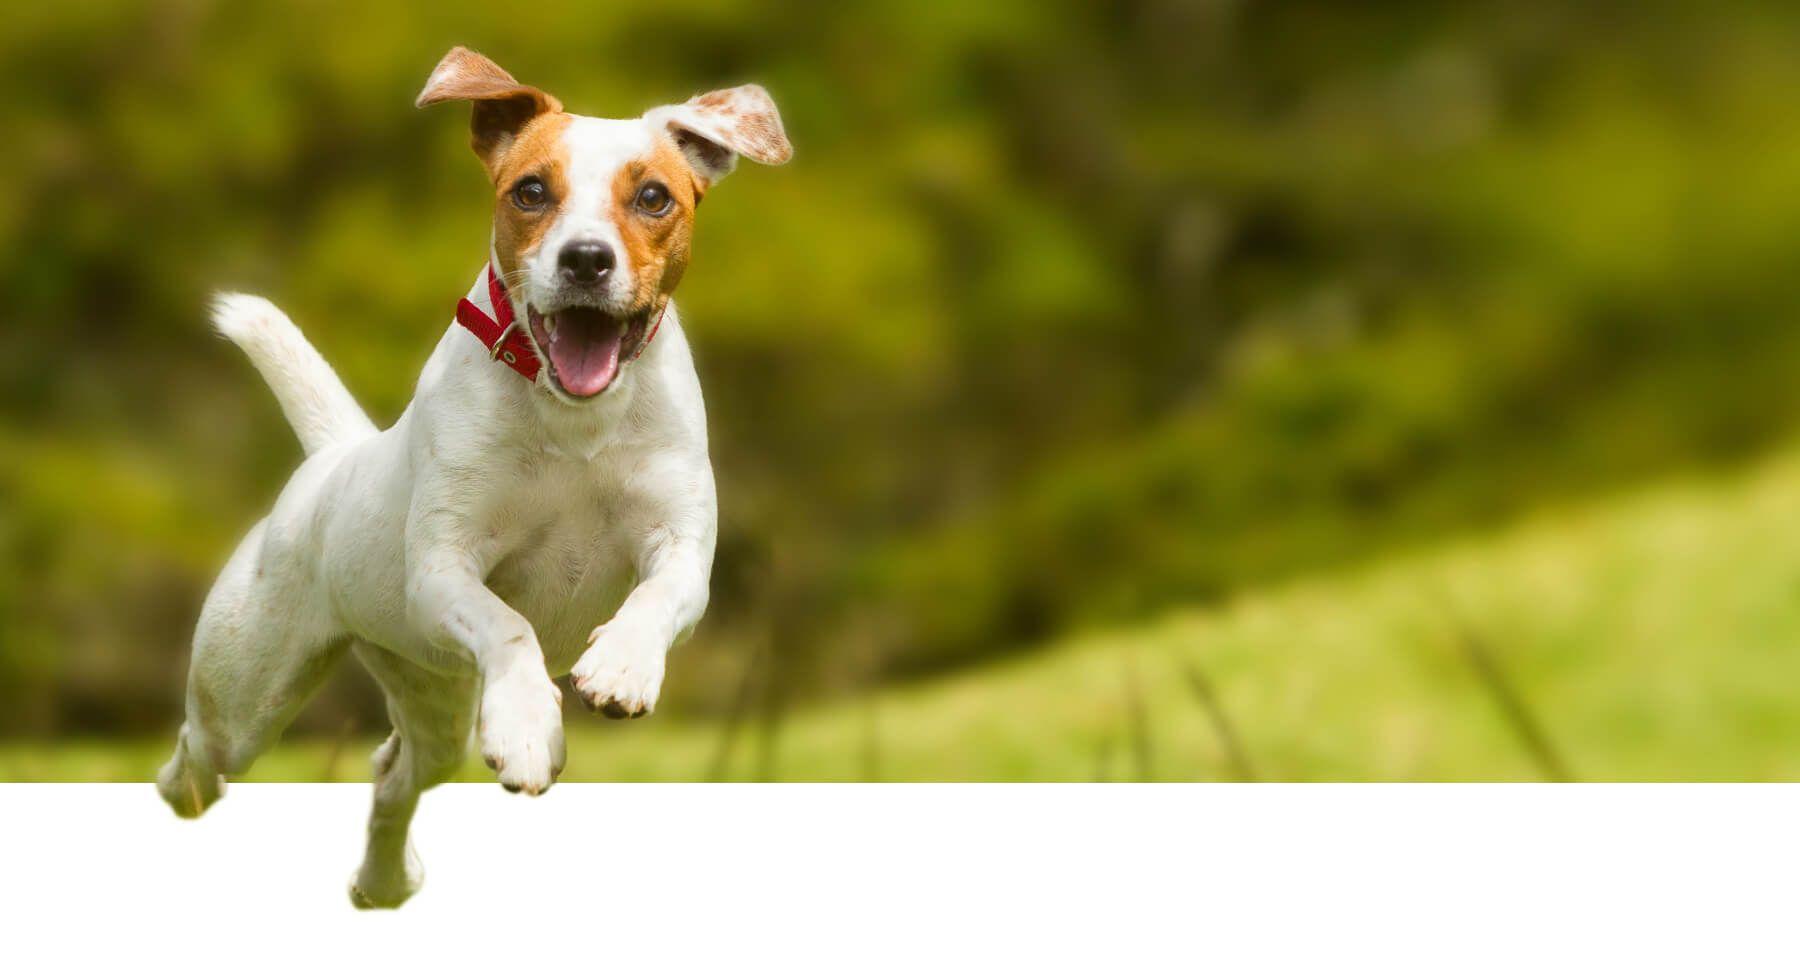 Jones Veterinary Hospital Veterinarian Pet Boarding Grooming In